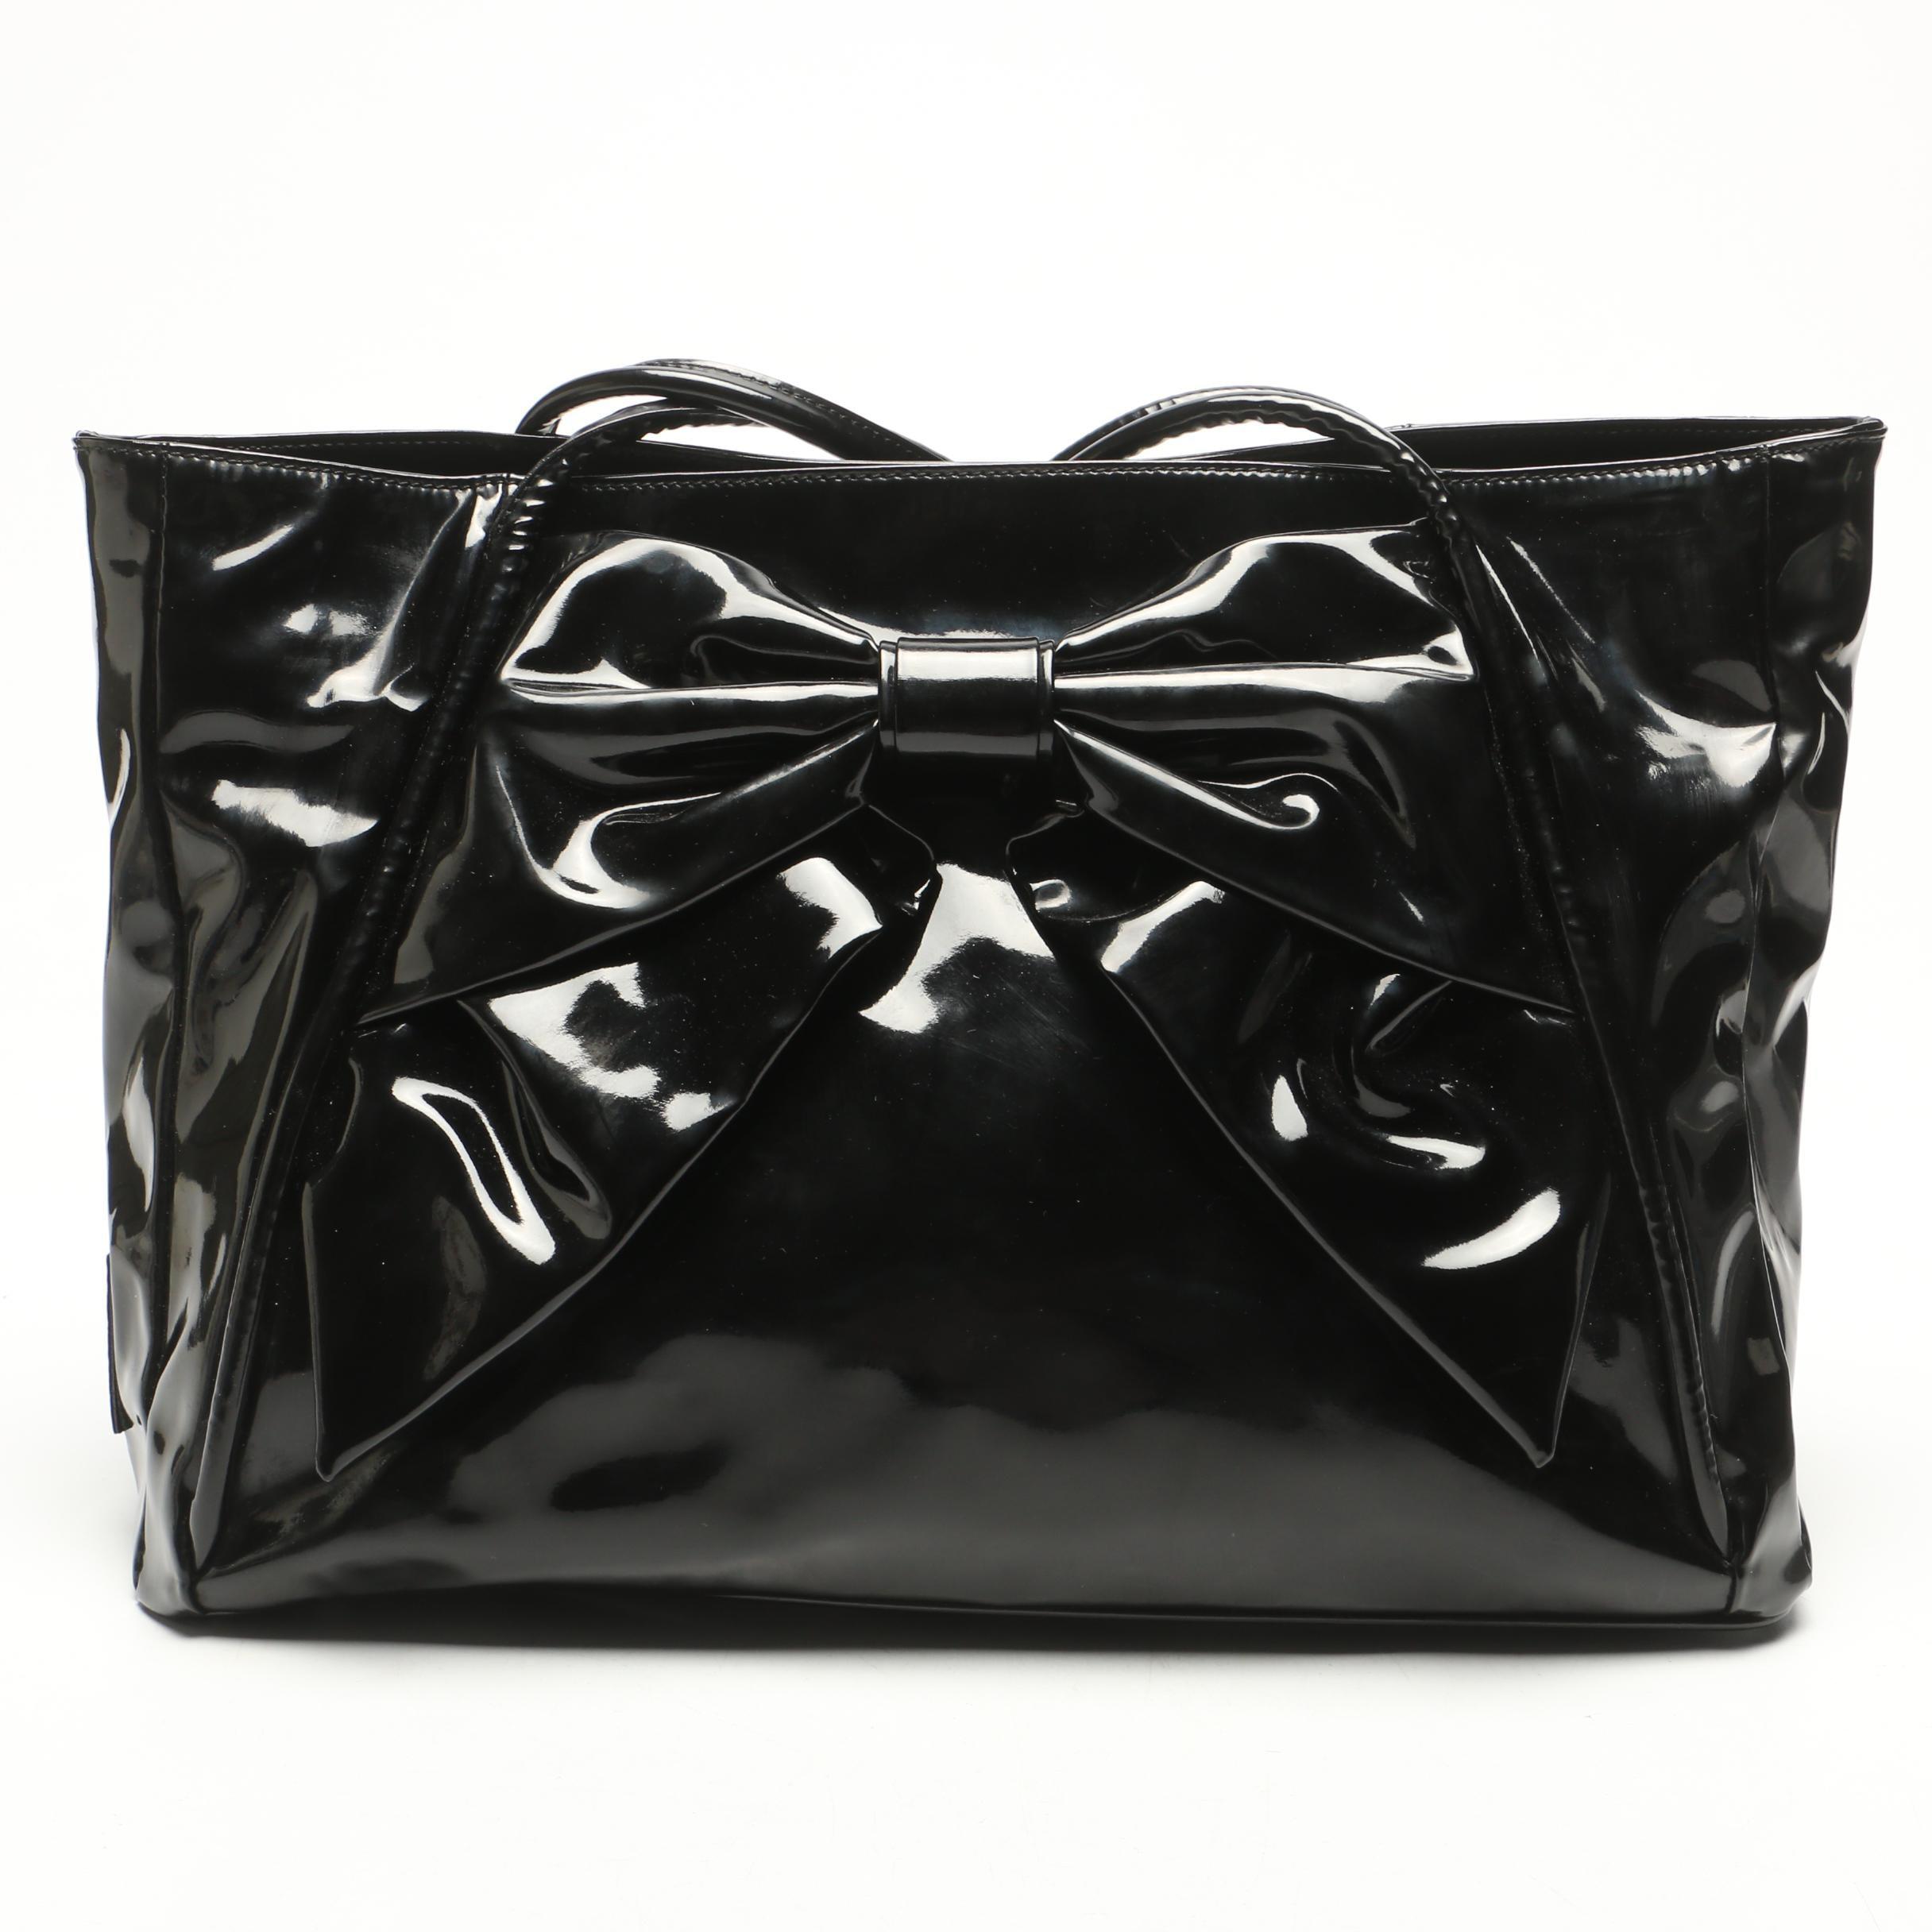 Valentino Black Patent Leather Bow Tote